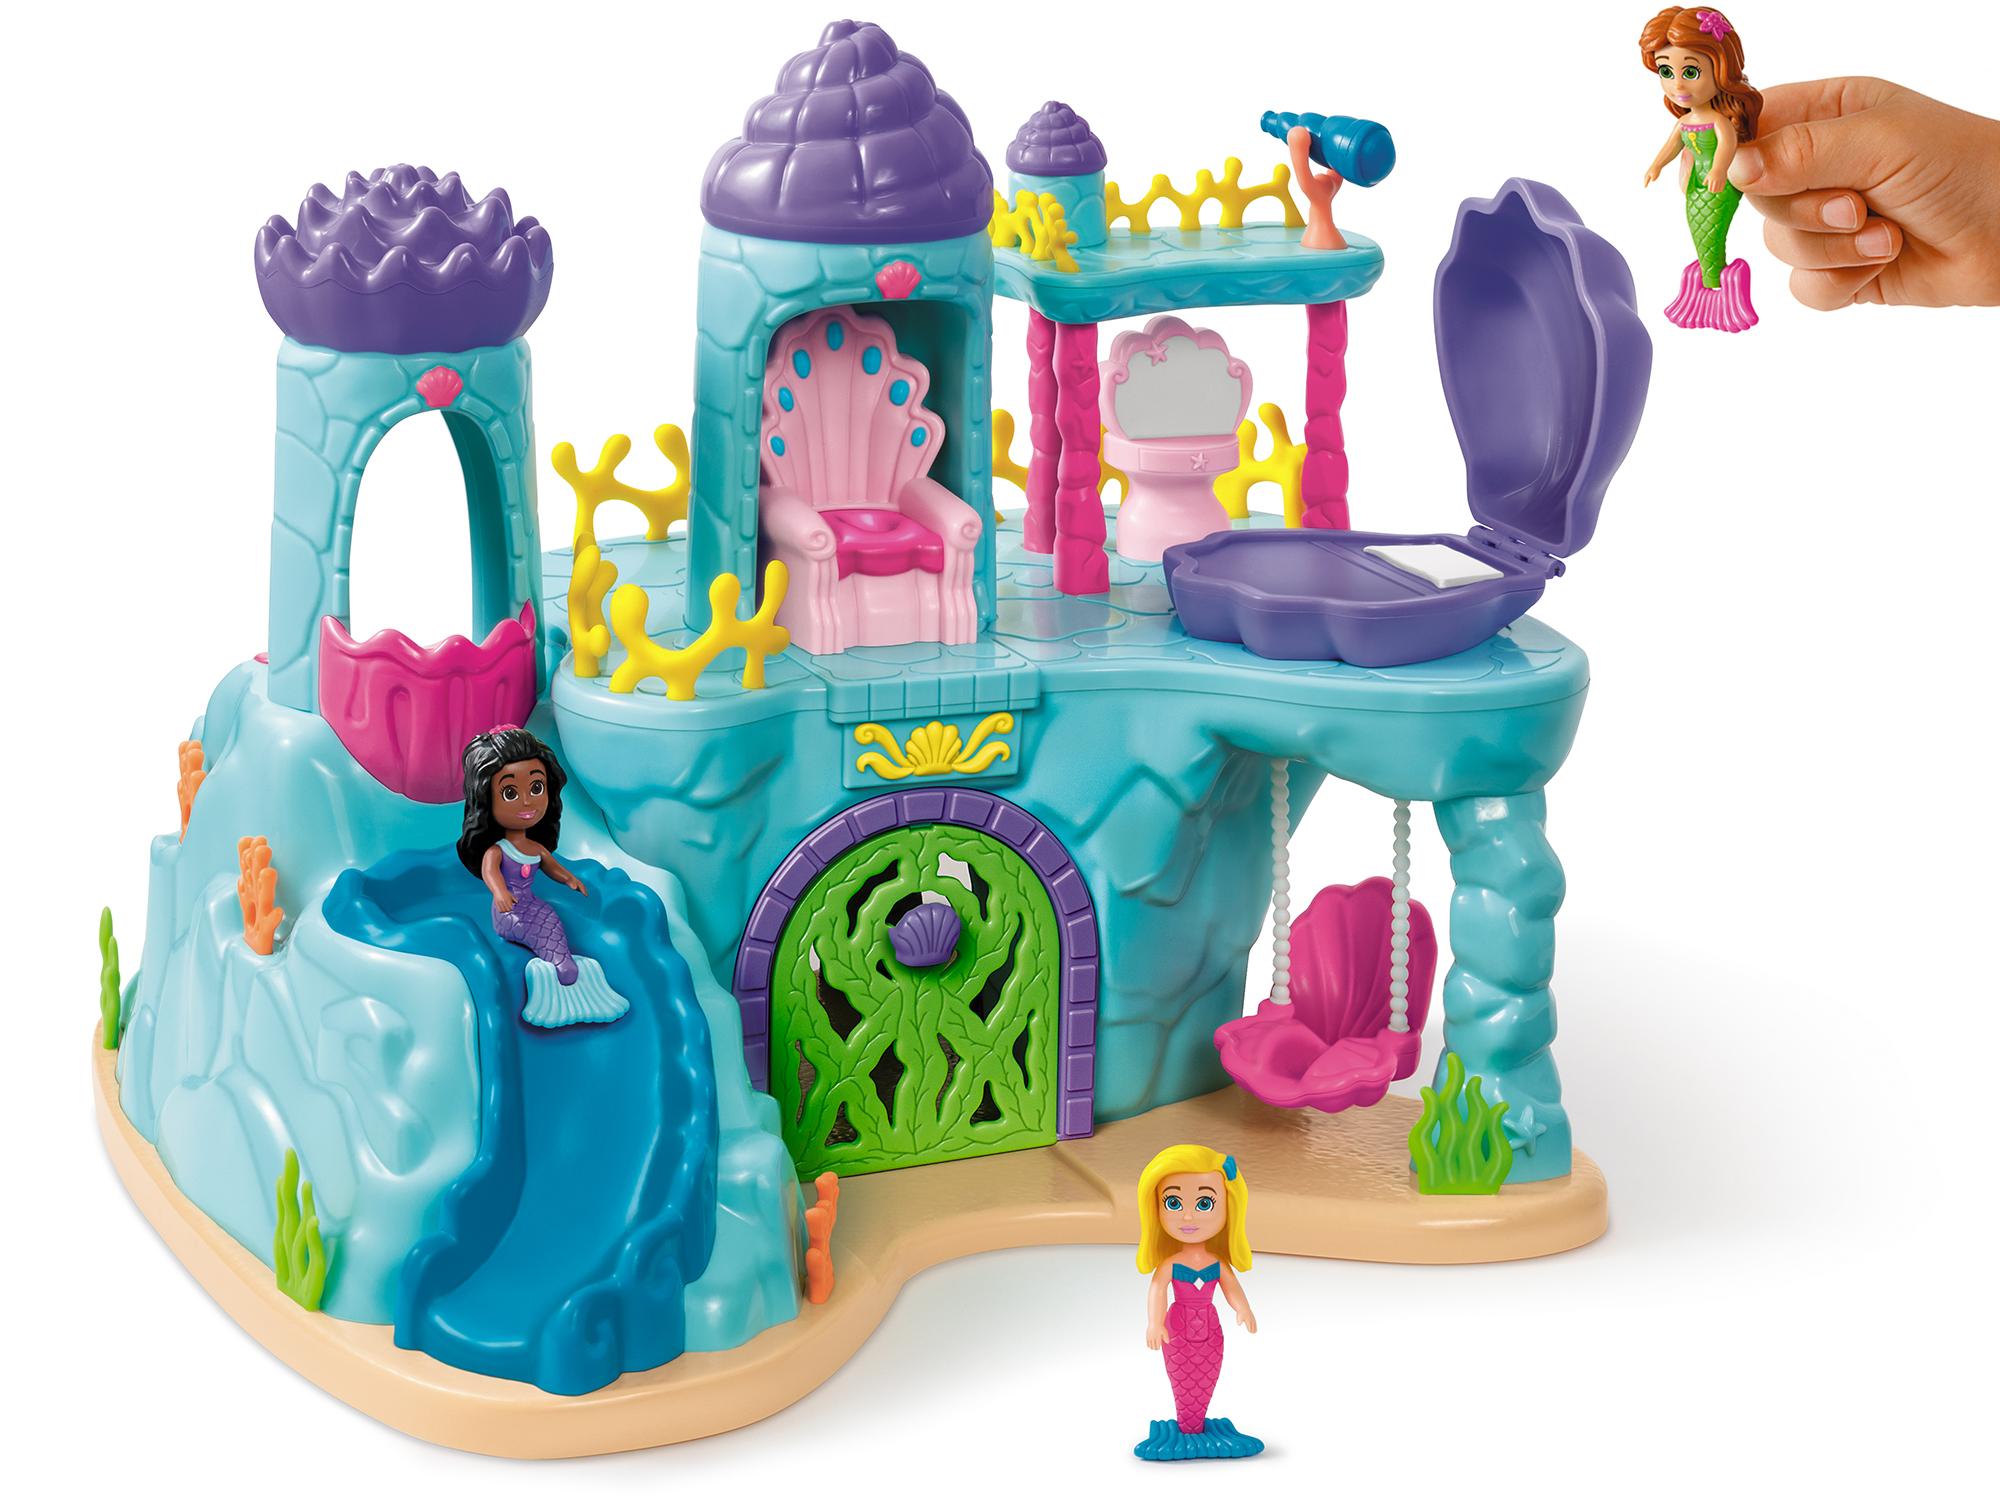 Under-The-Sea Mermaid Palace